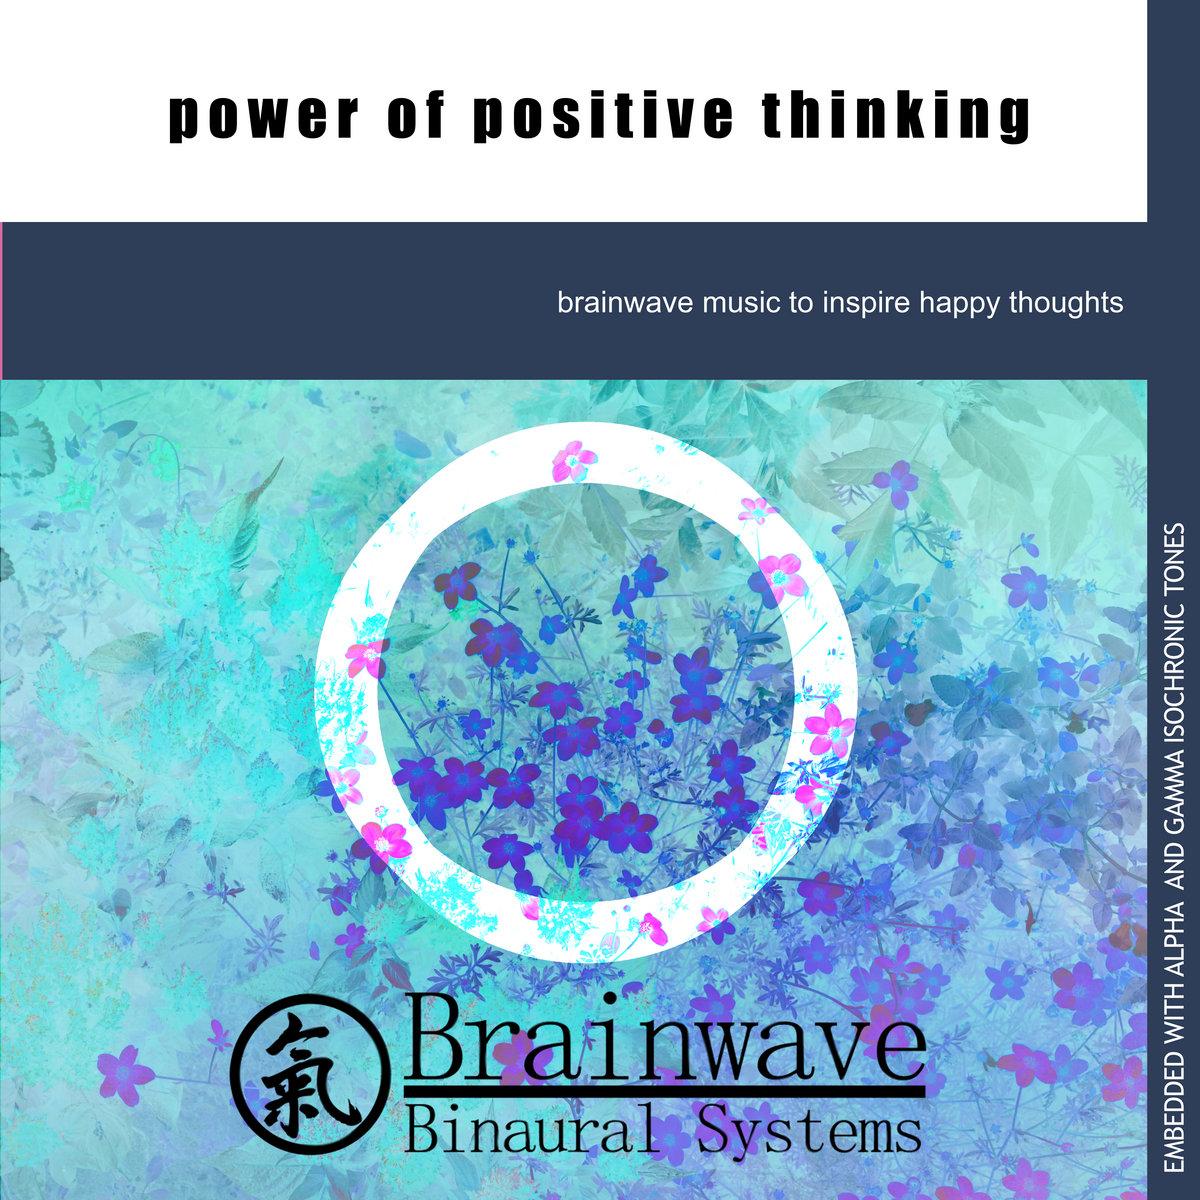 Power Of Positive Thinking | Brainwave Binaural Systems